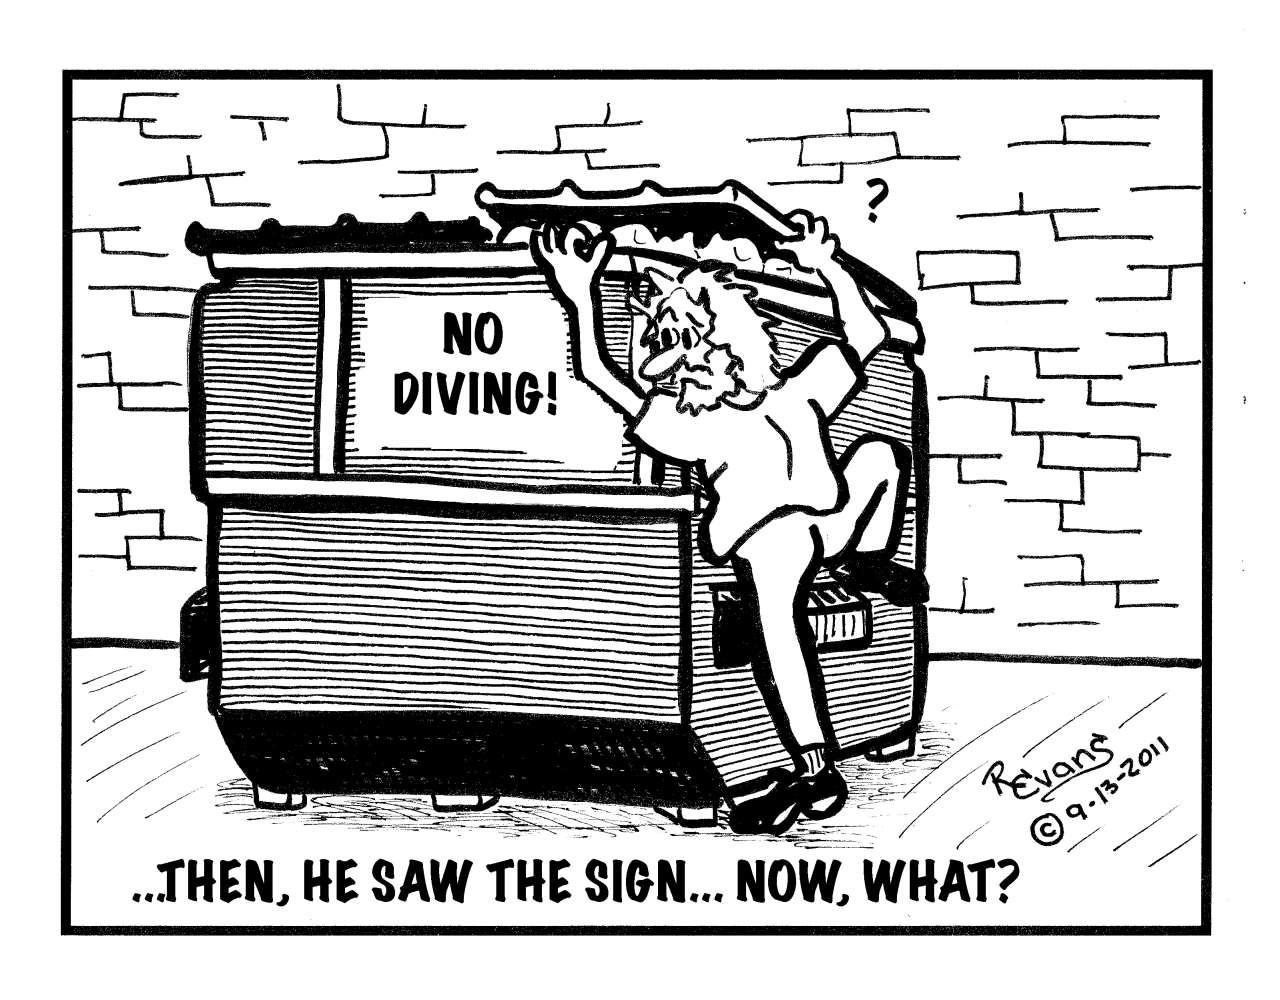 Dumpster Diving Cartoon Dumpster diving has become a